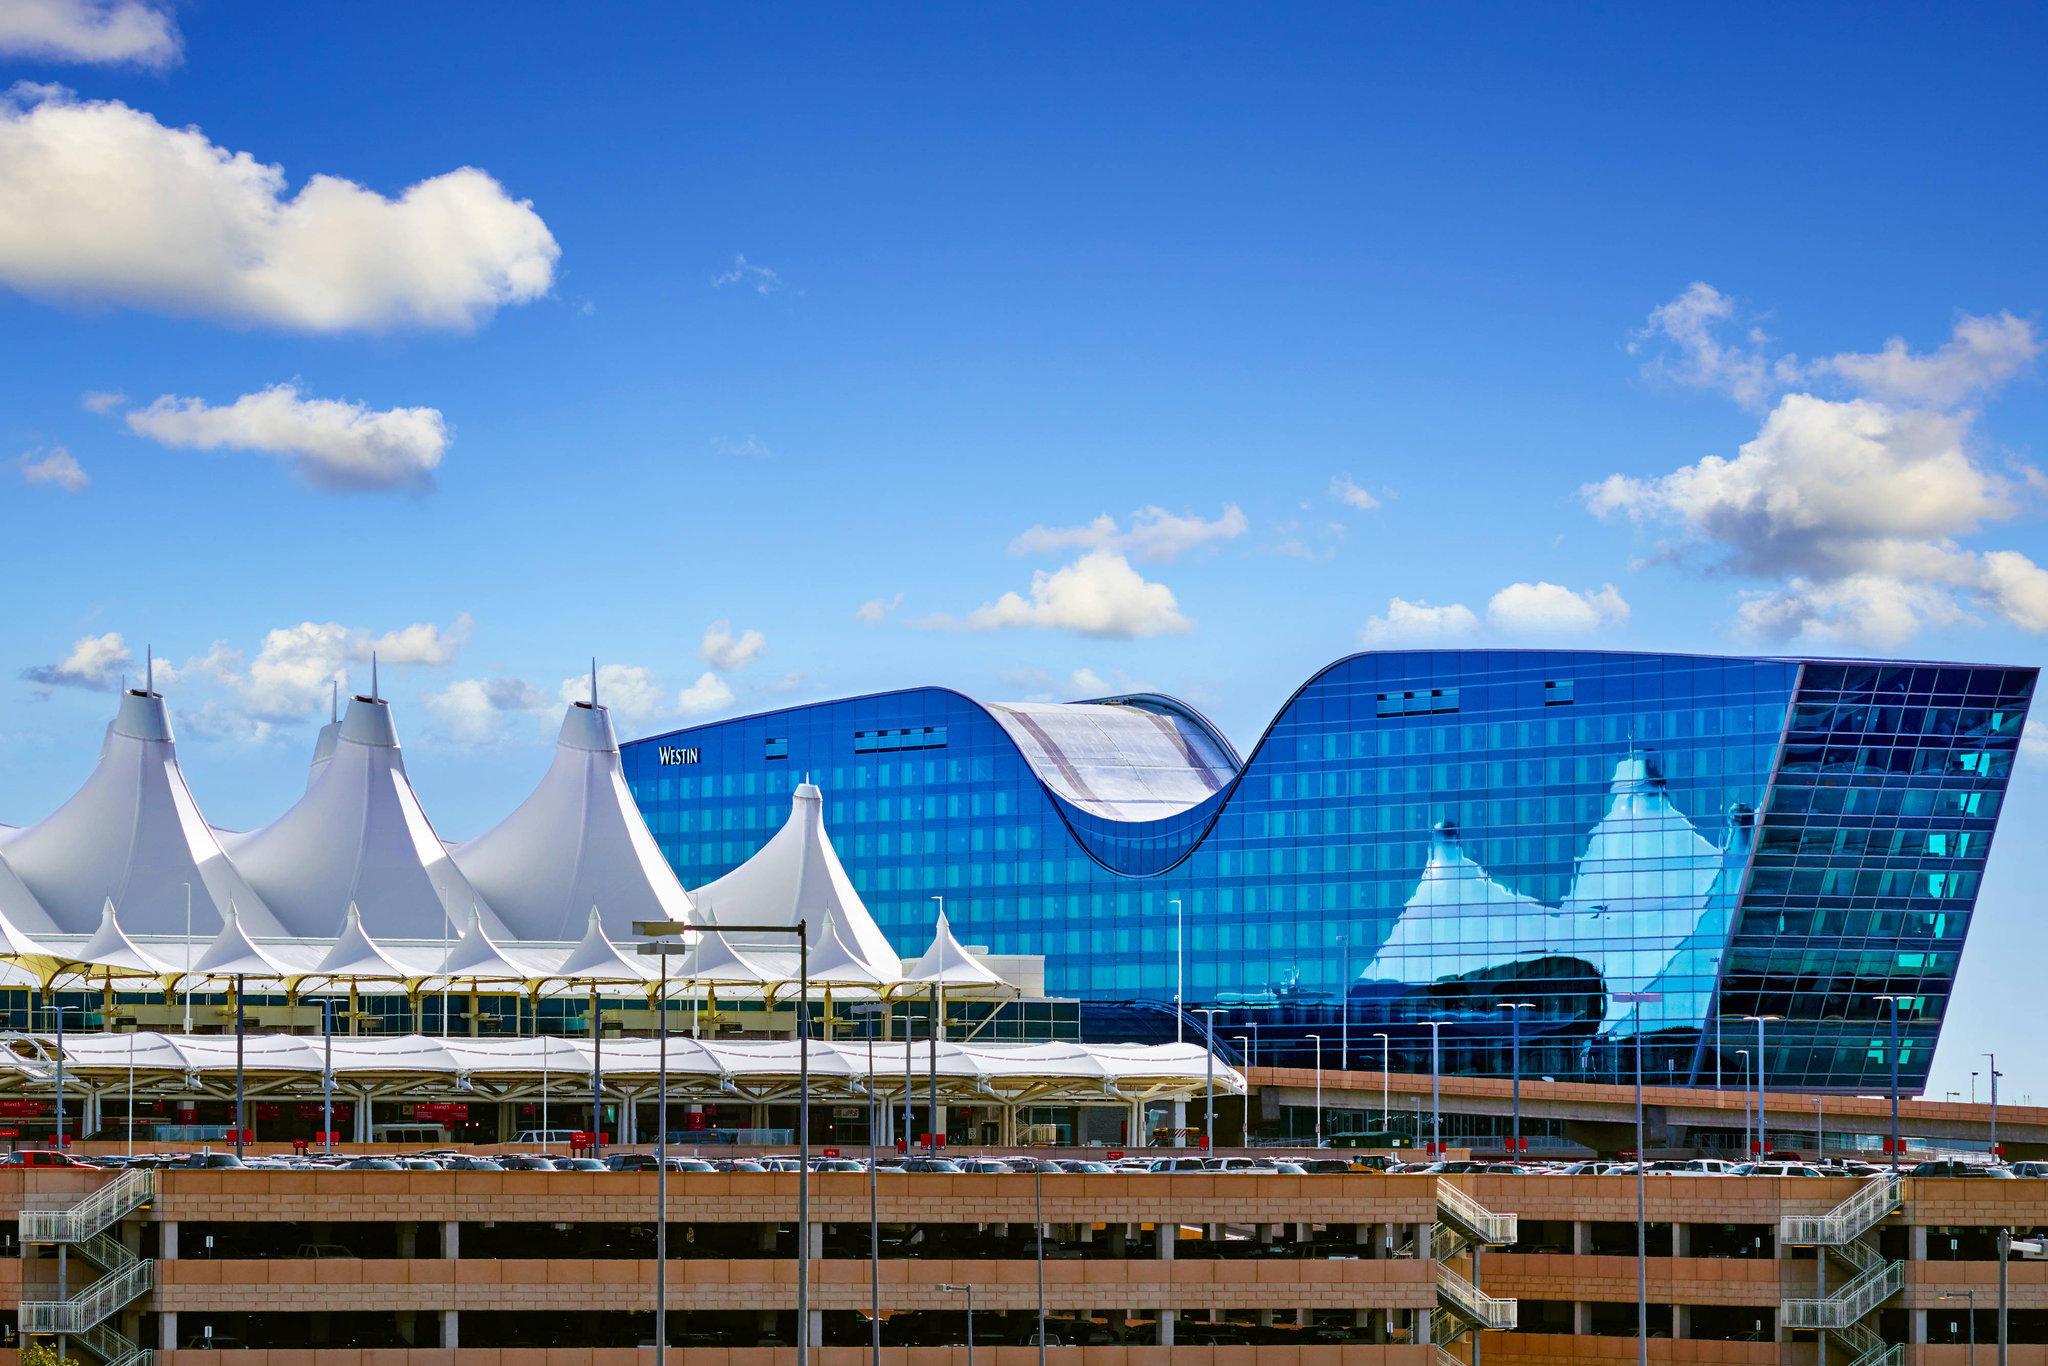 The Westin Denver International Airport